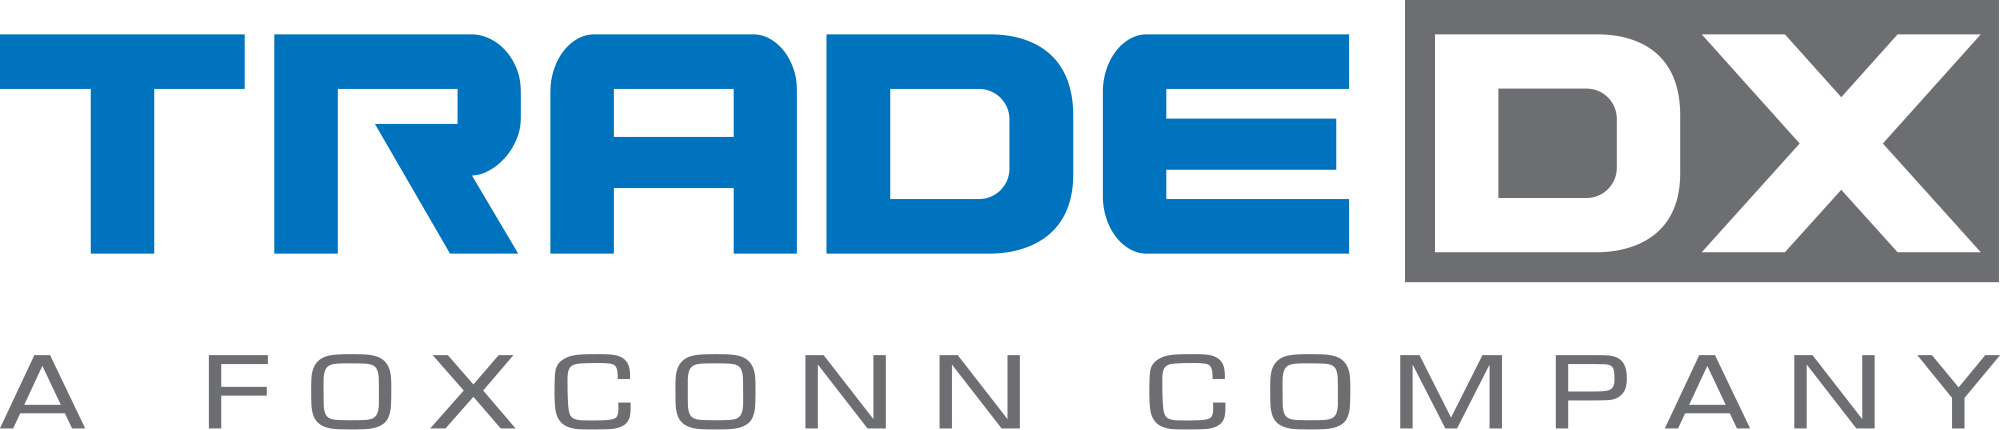 A Foxconn company